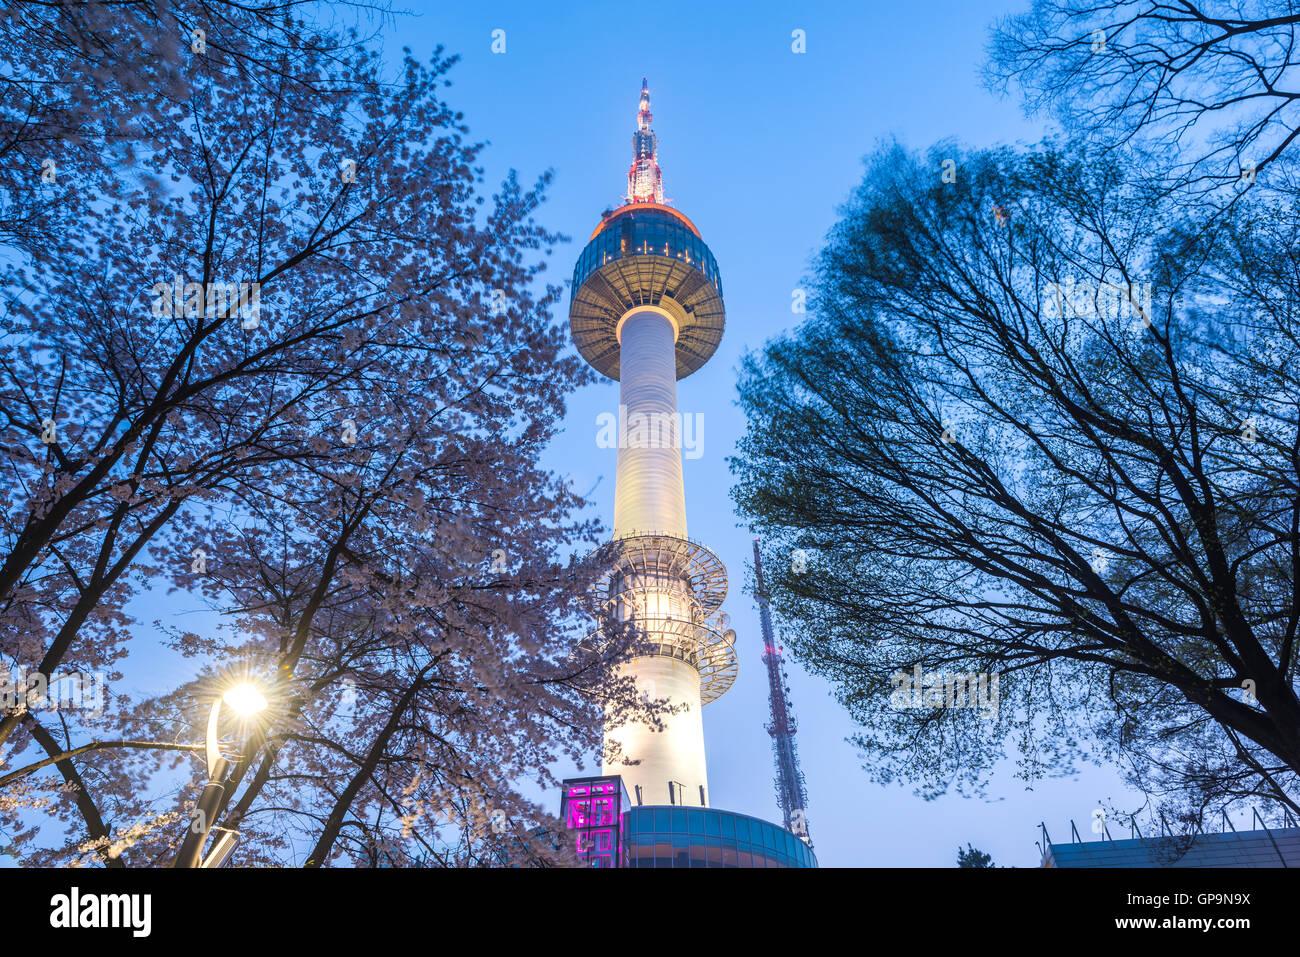 En la noche de la torre de Seúl en Seúl, Corea del Sur Imagen De Stock